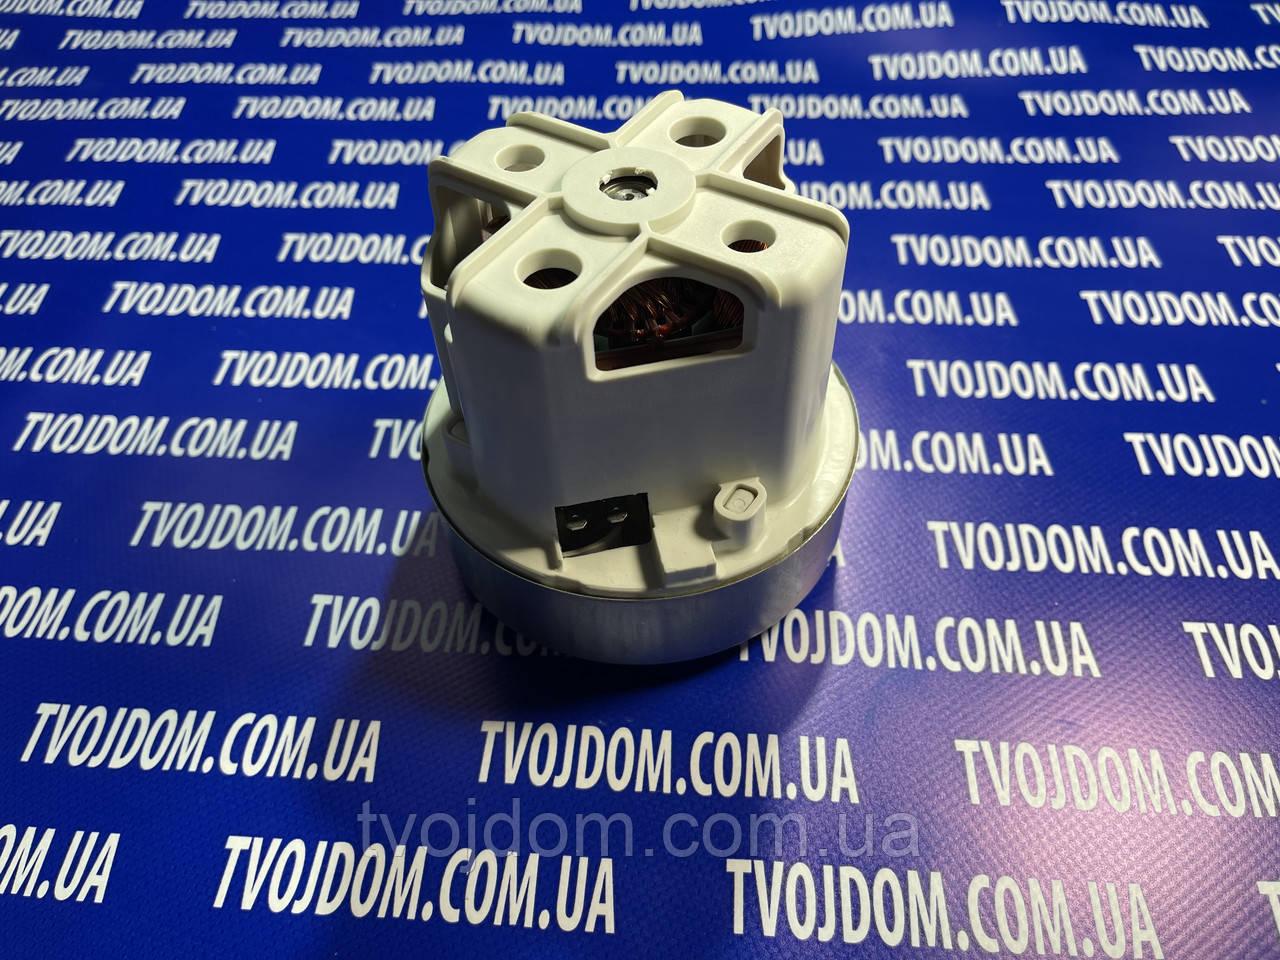 Двигатель для пылесоса Philips HX-70L 1600W (VC07W112FQ)